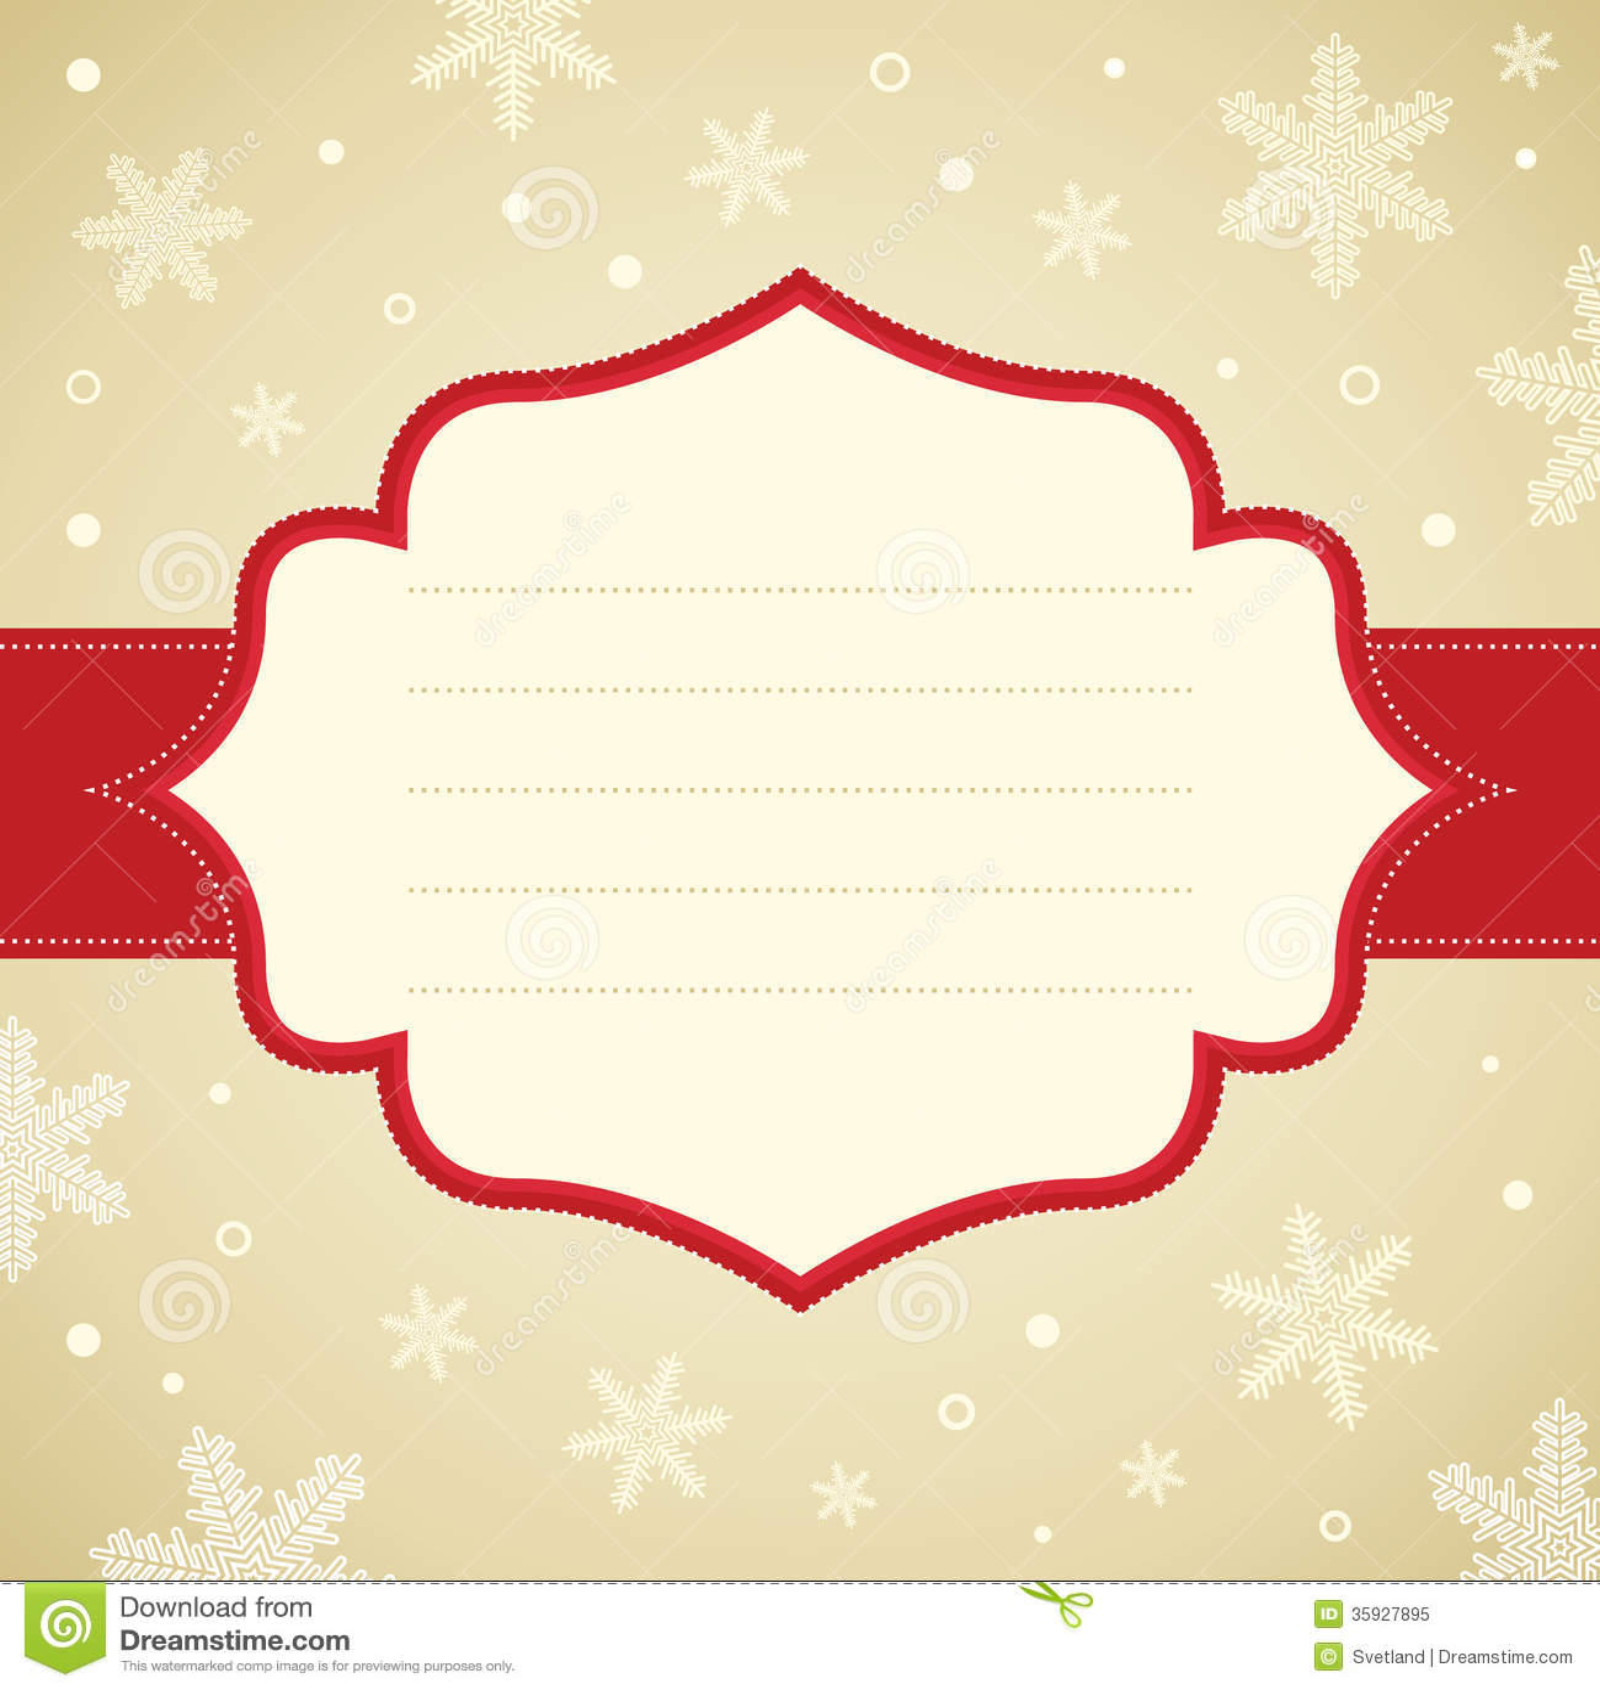 Christmas Snowflake Frame Royalty Free Stock Photo